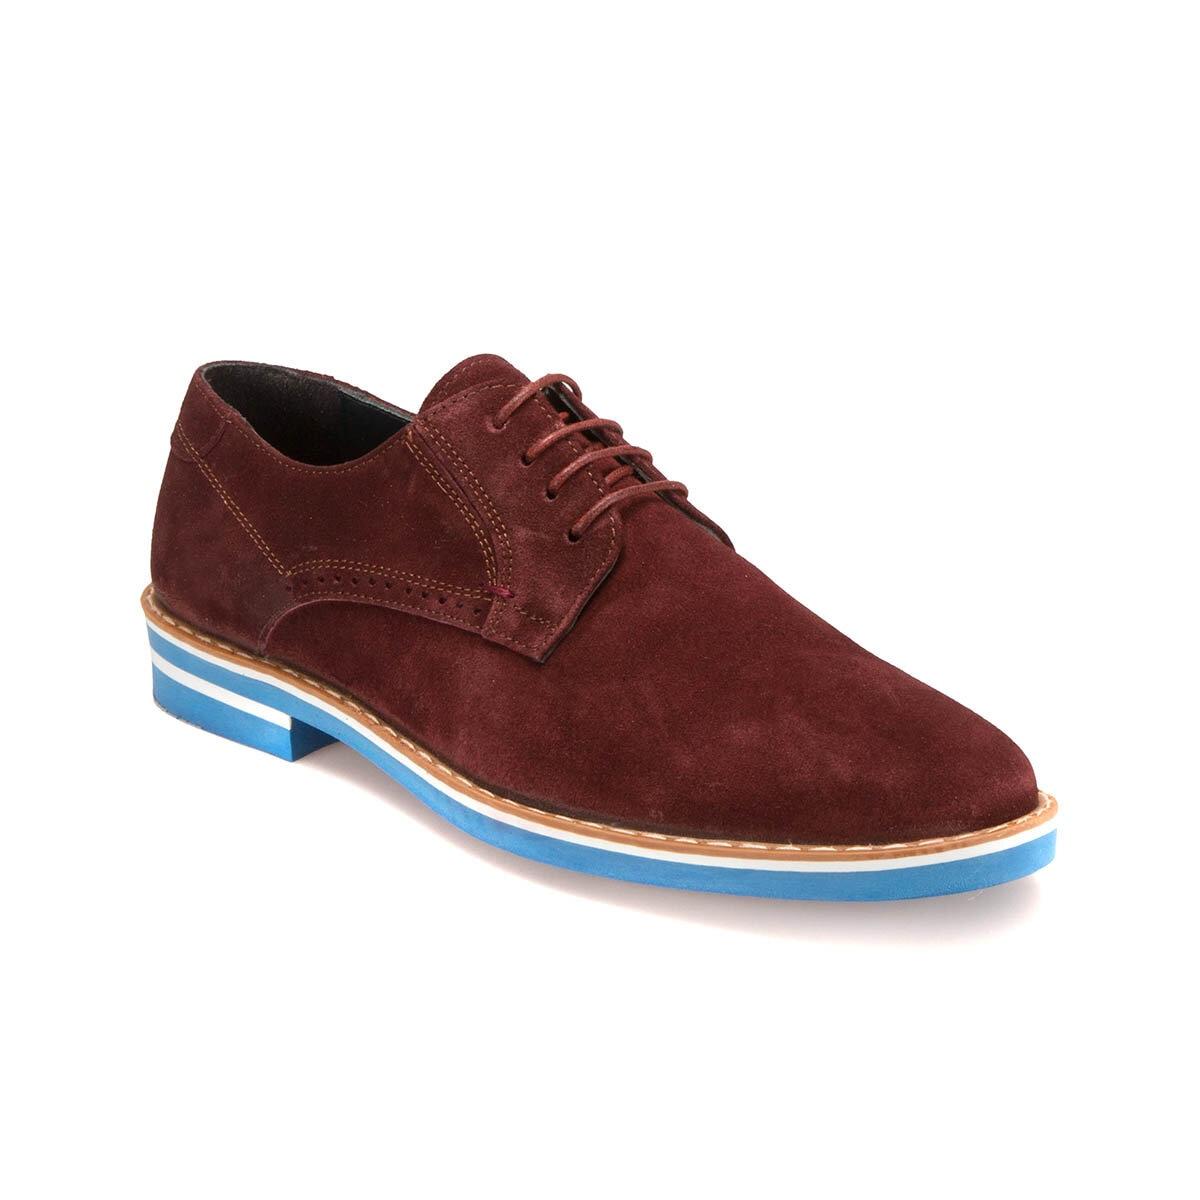 FLO PRG-24 M 6683 Burgundy Men 'S Modern Shoes JJ-Stiller